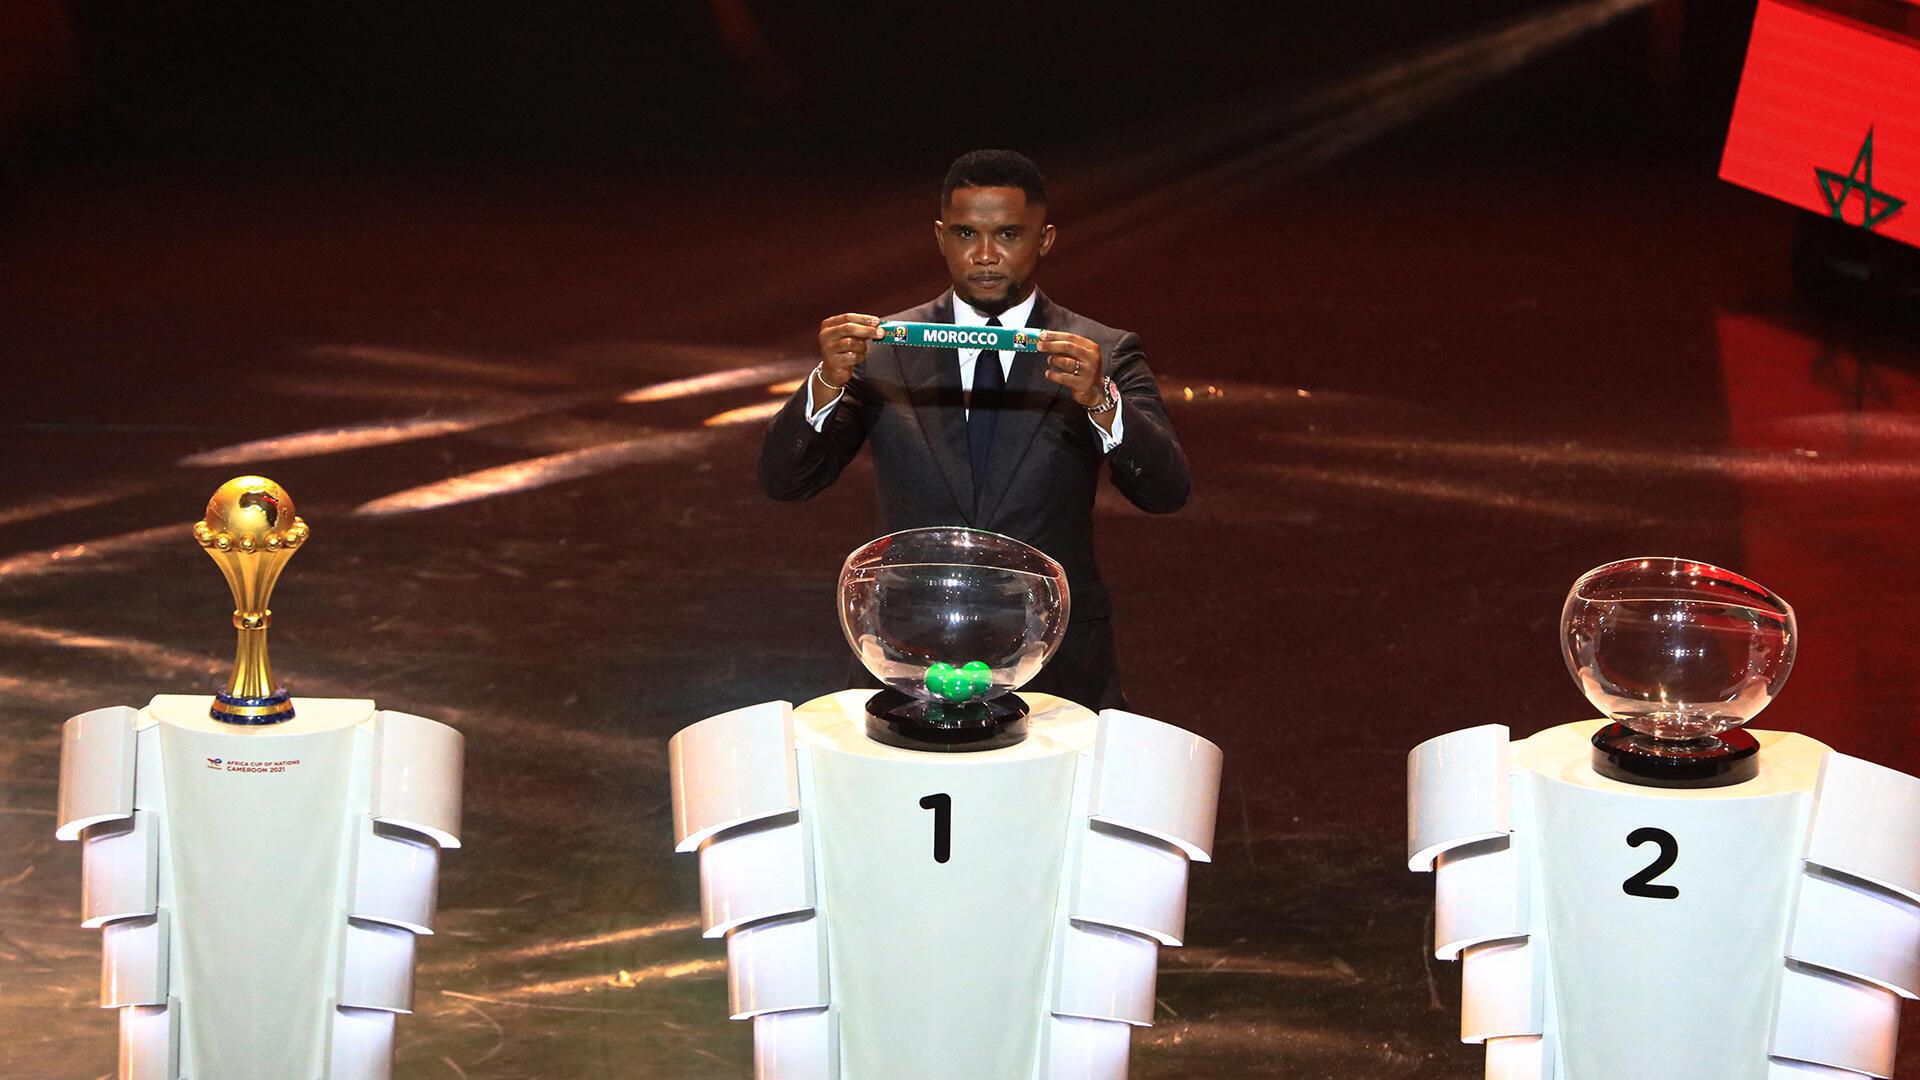 Football - Samuel Eto'o - Cameroun - Yaoundé -  tirage au sort CAN 2022 - AFP - 000_9LA7F2 - 17 août 2021